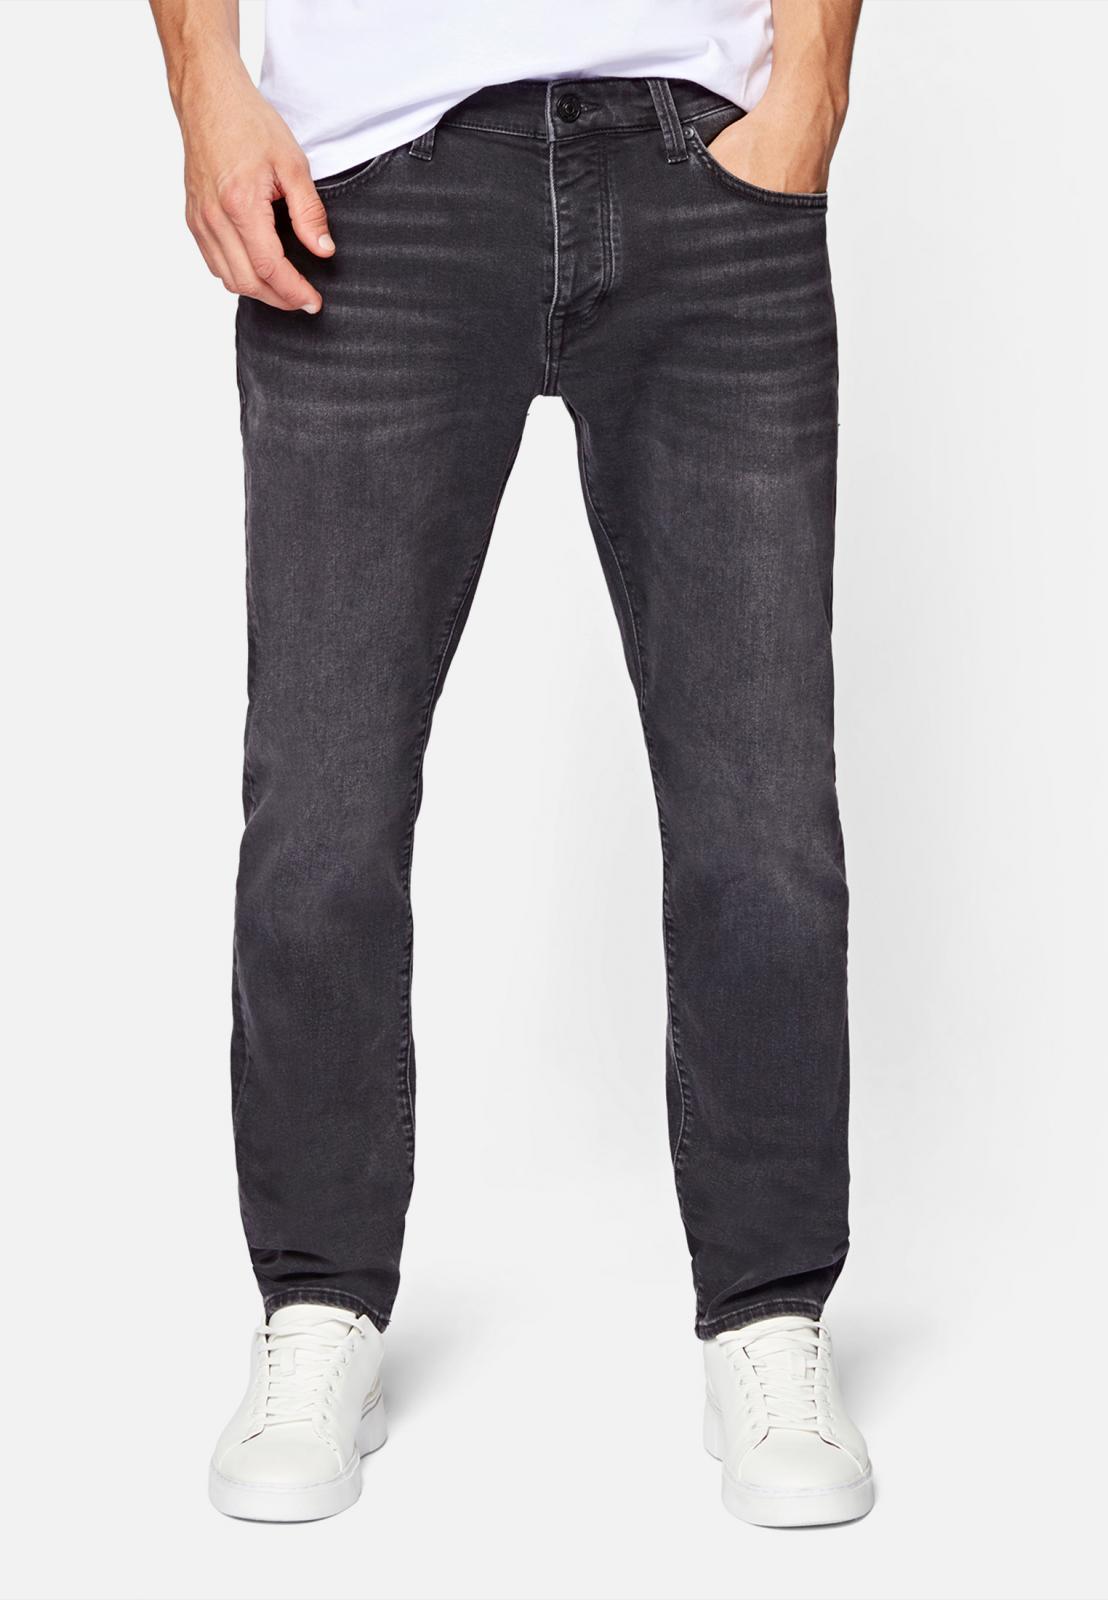 YVES | Slim Skinny Jeans grau/schwarz